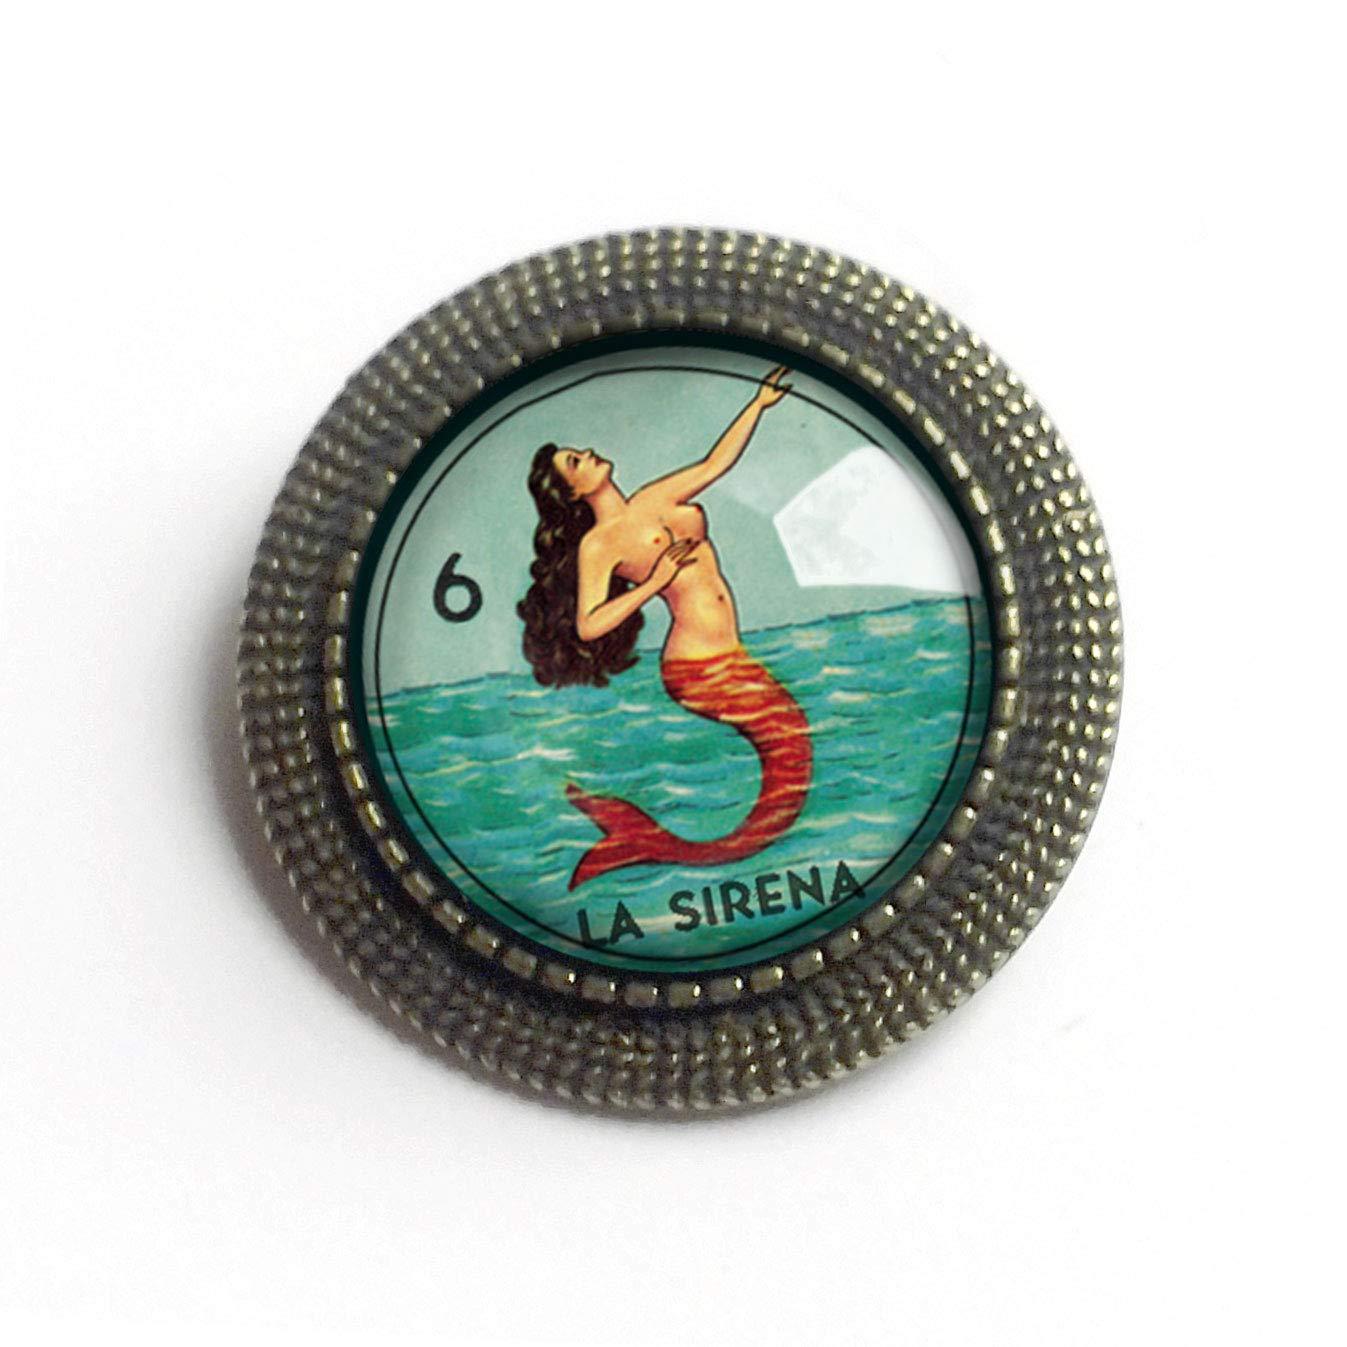 La Sirena Loteria Mermaid Glass and Brass Brooch